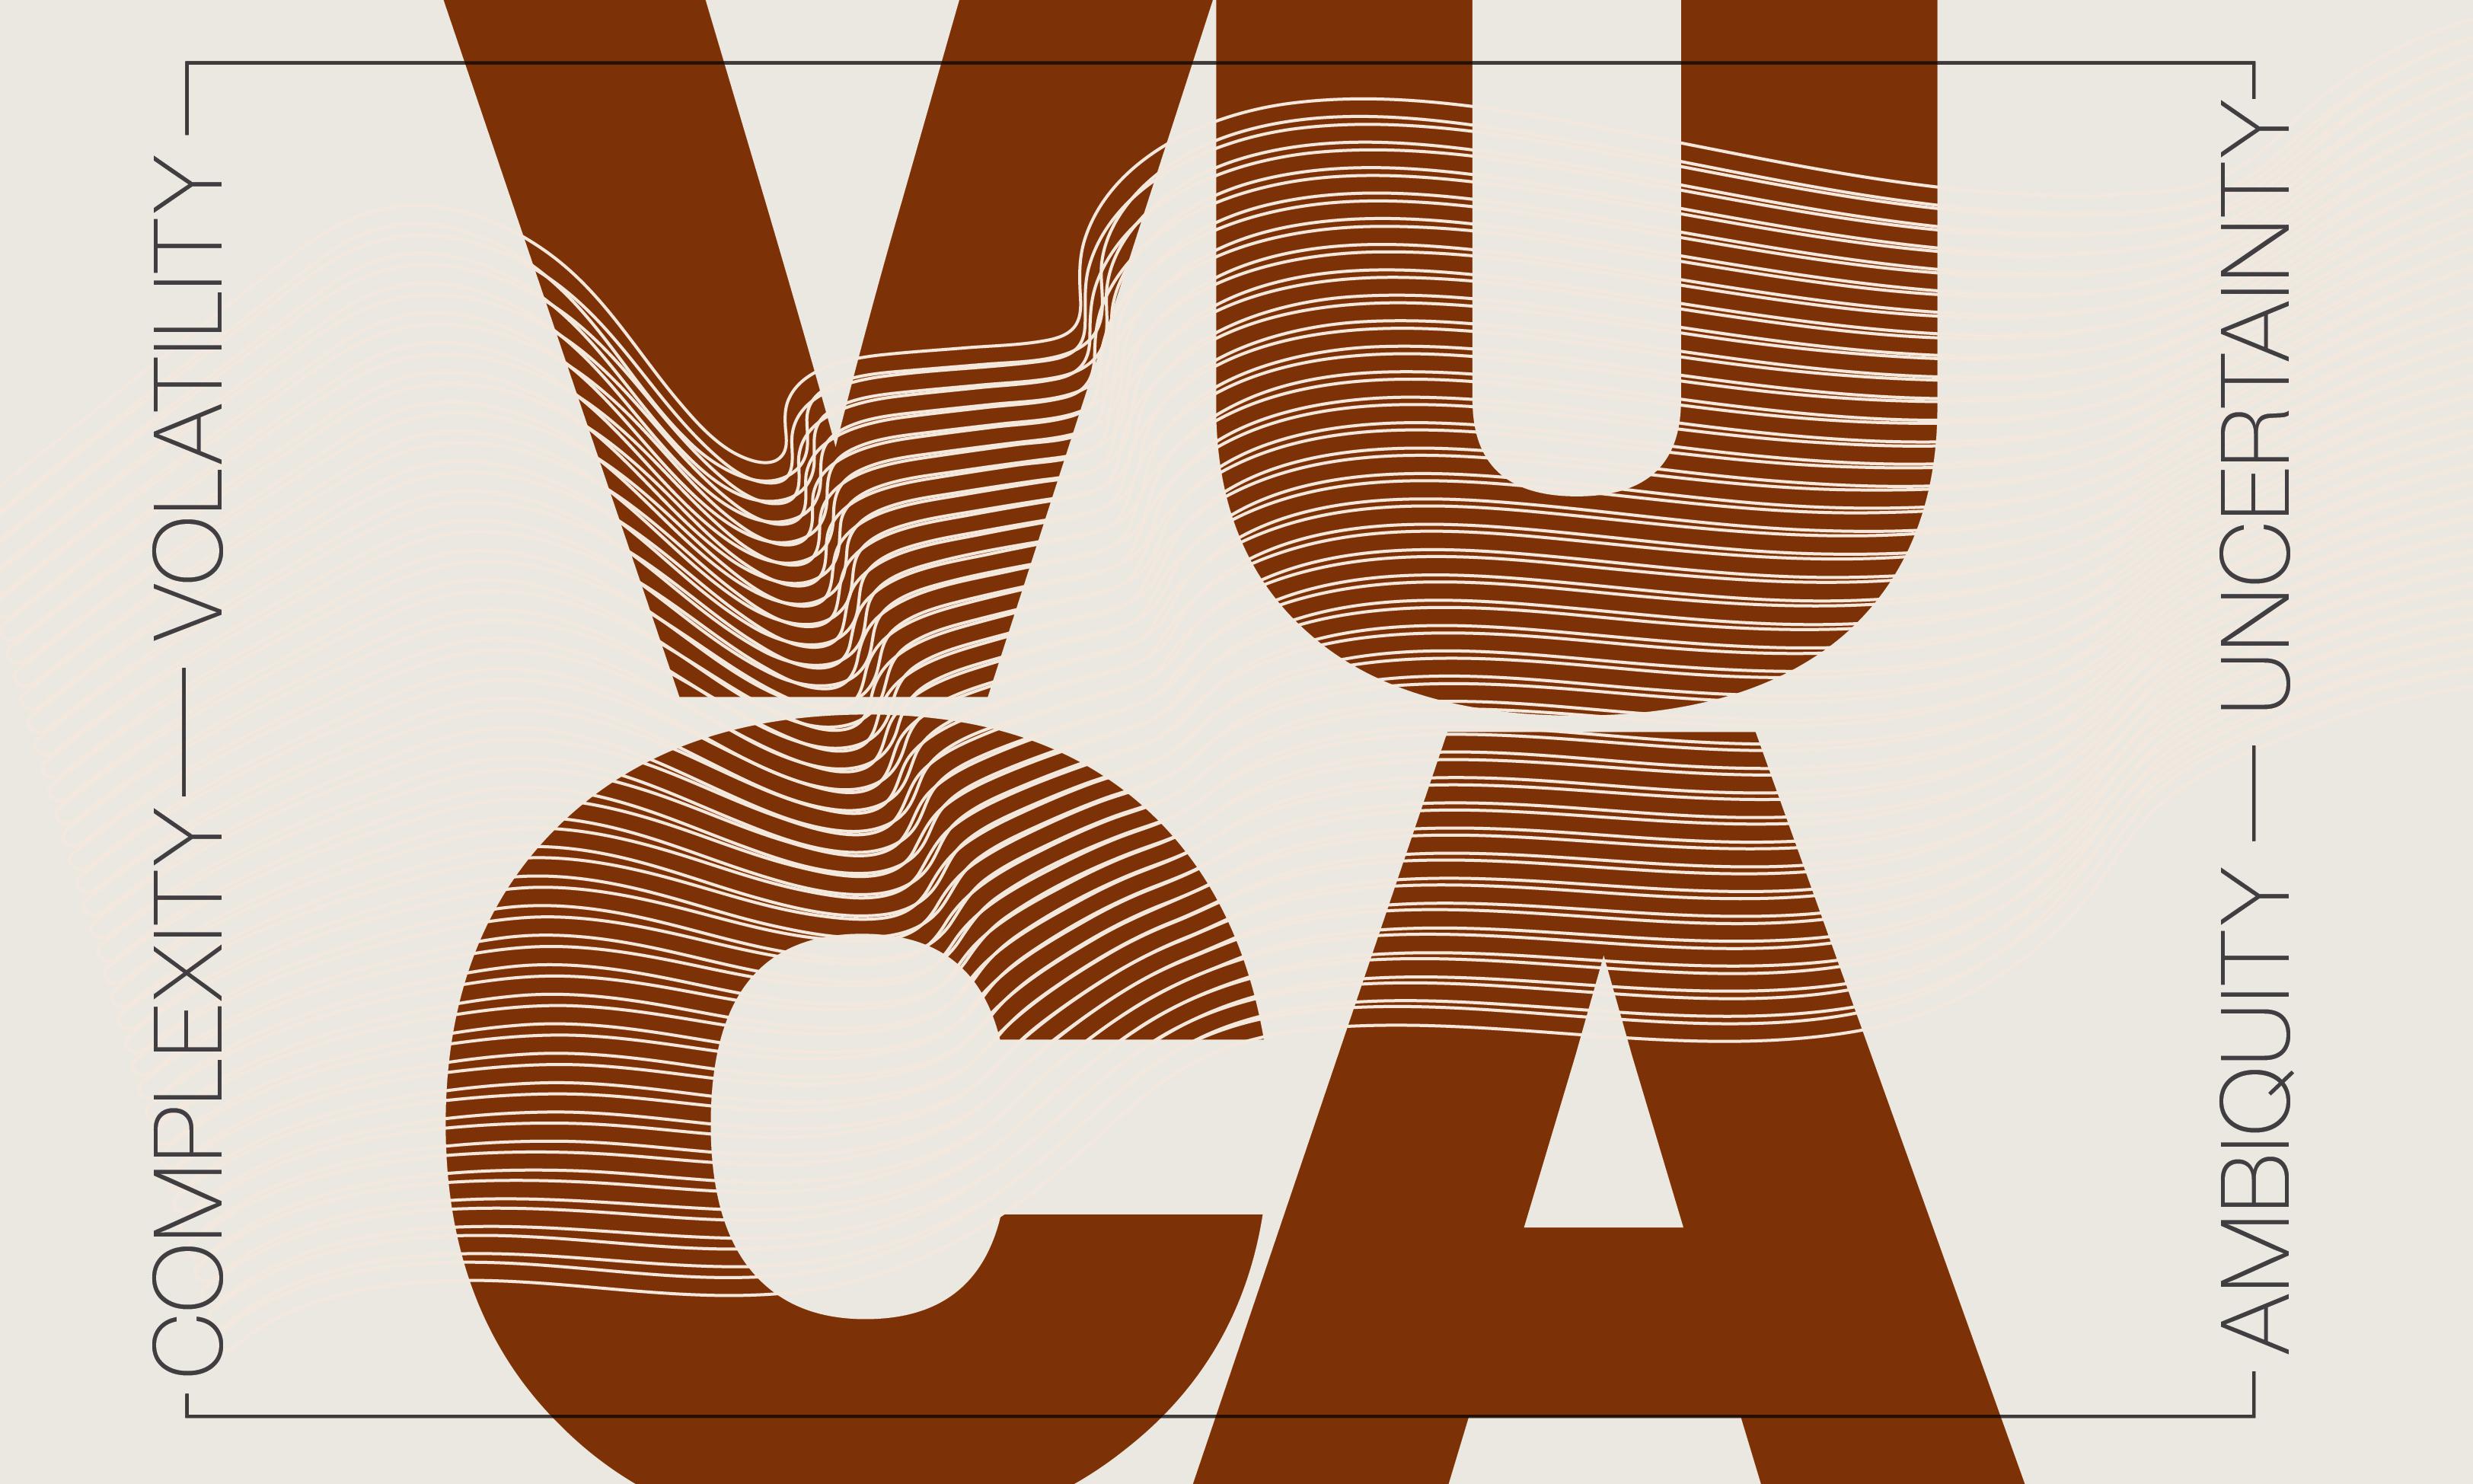 Schaubild zu VUCA: Volatility, Uncertainty, Complexity, Ambiguity